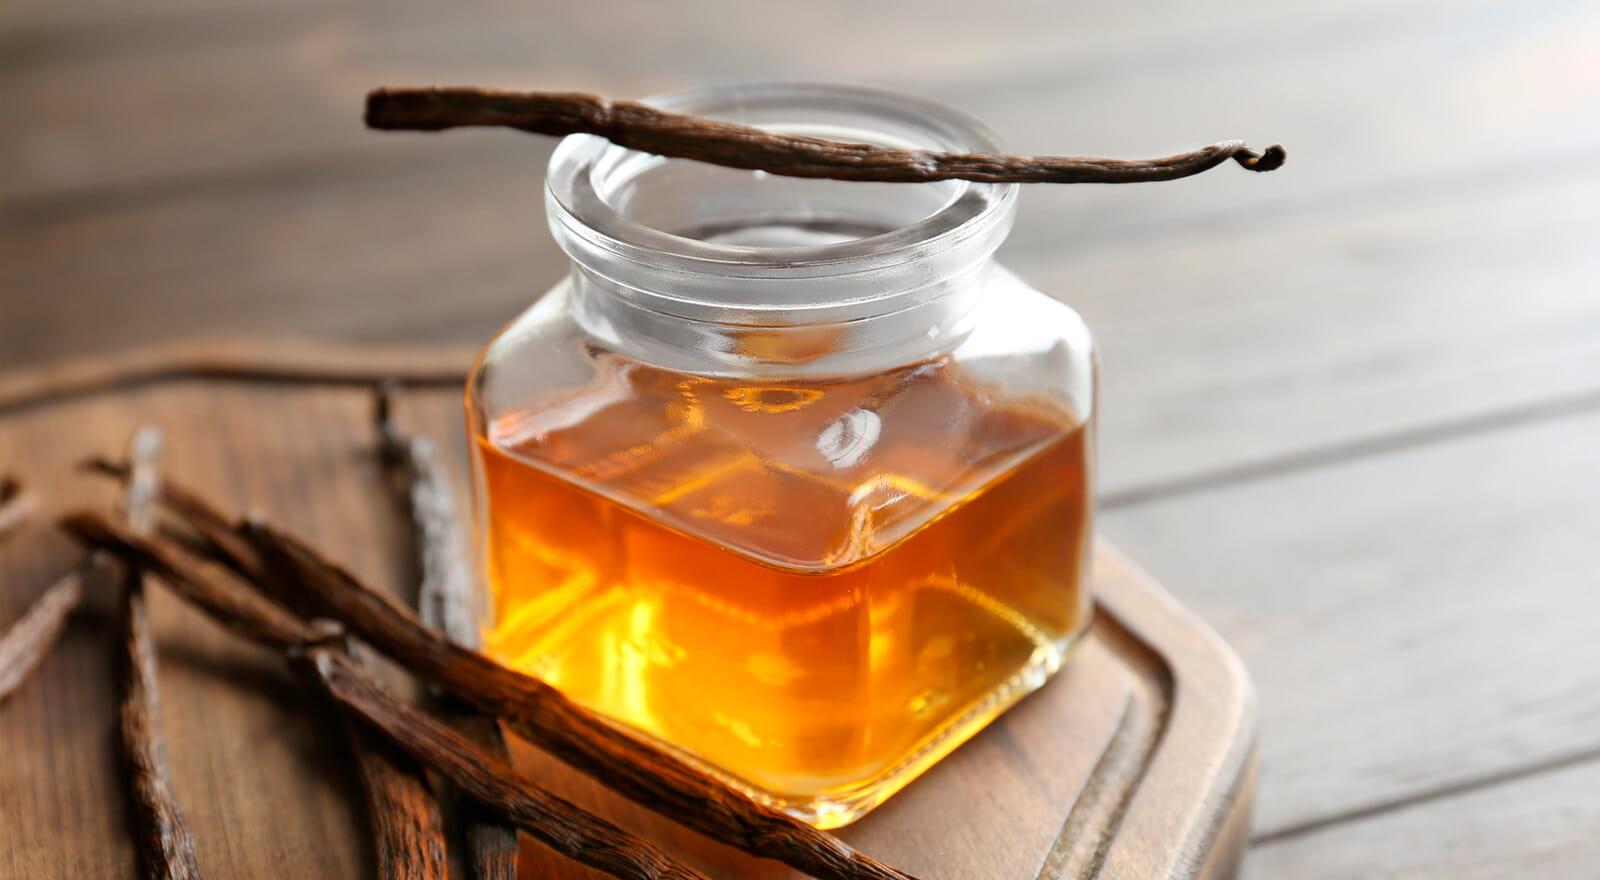 Jar of vanilla extract